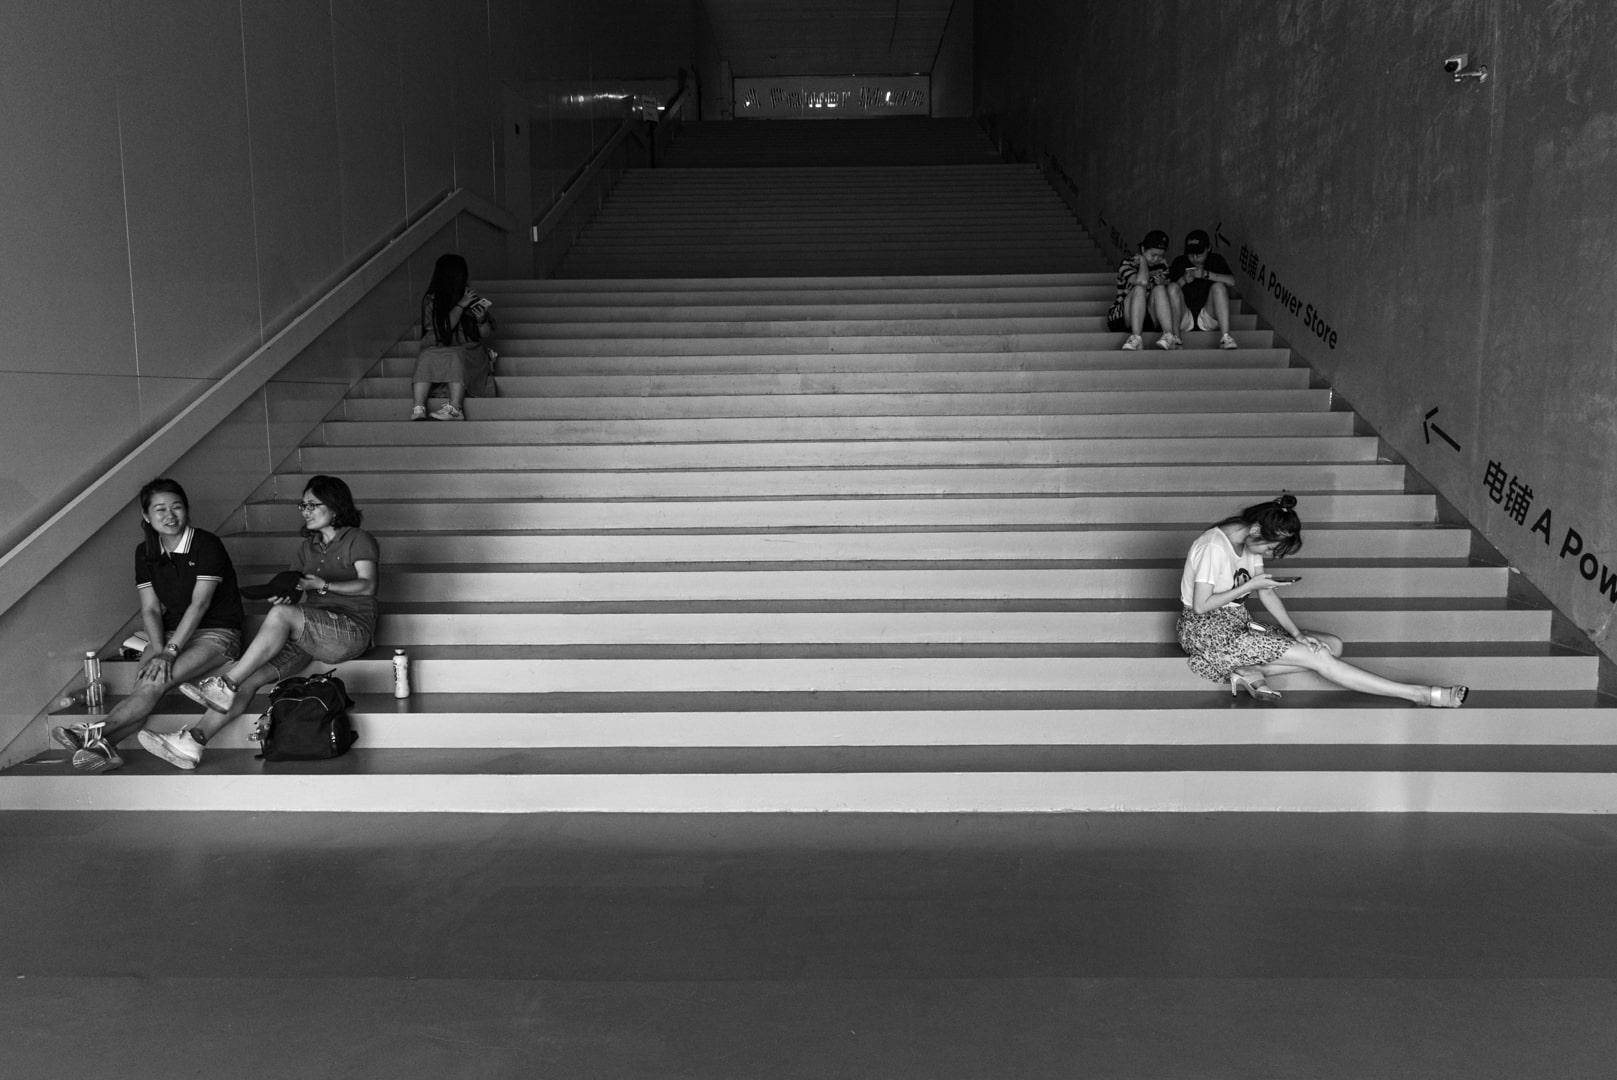 Social Distancing full